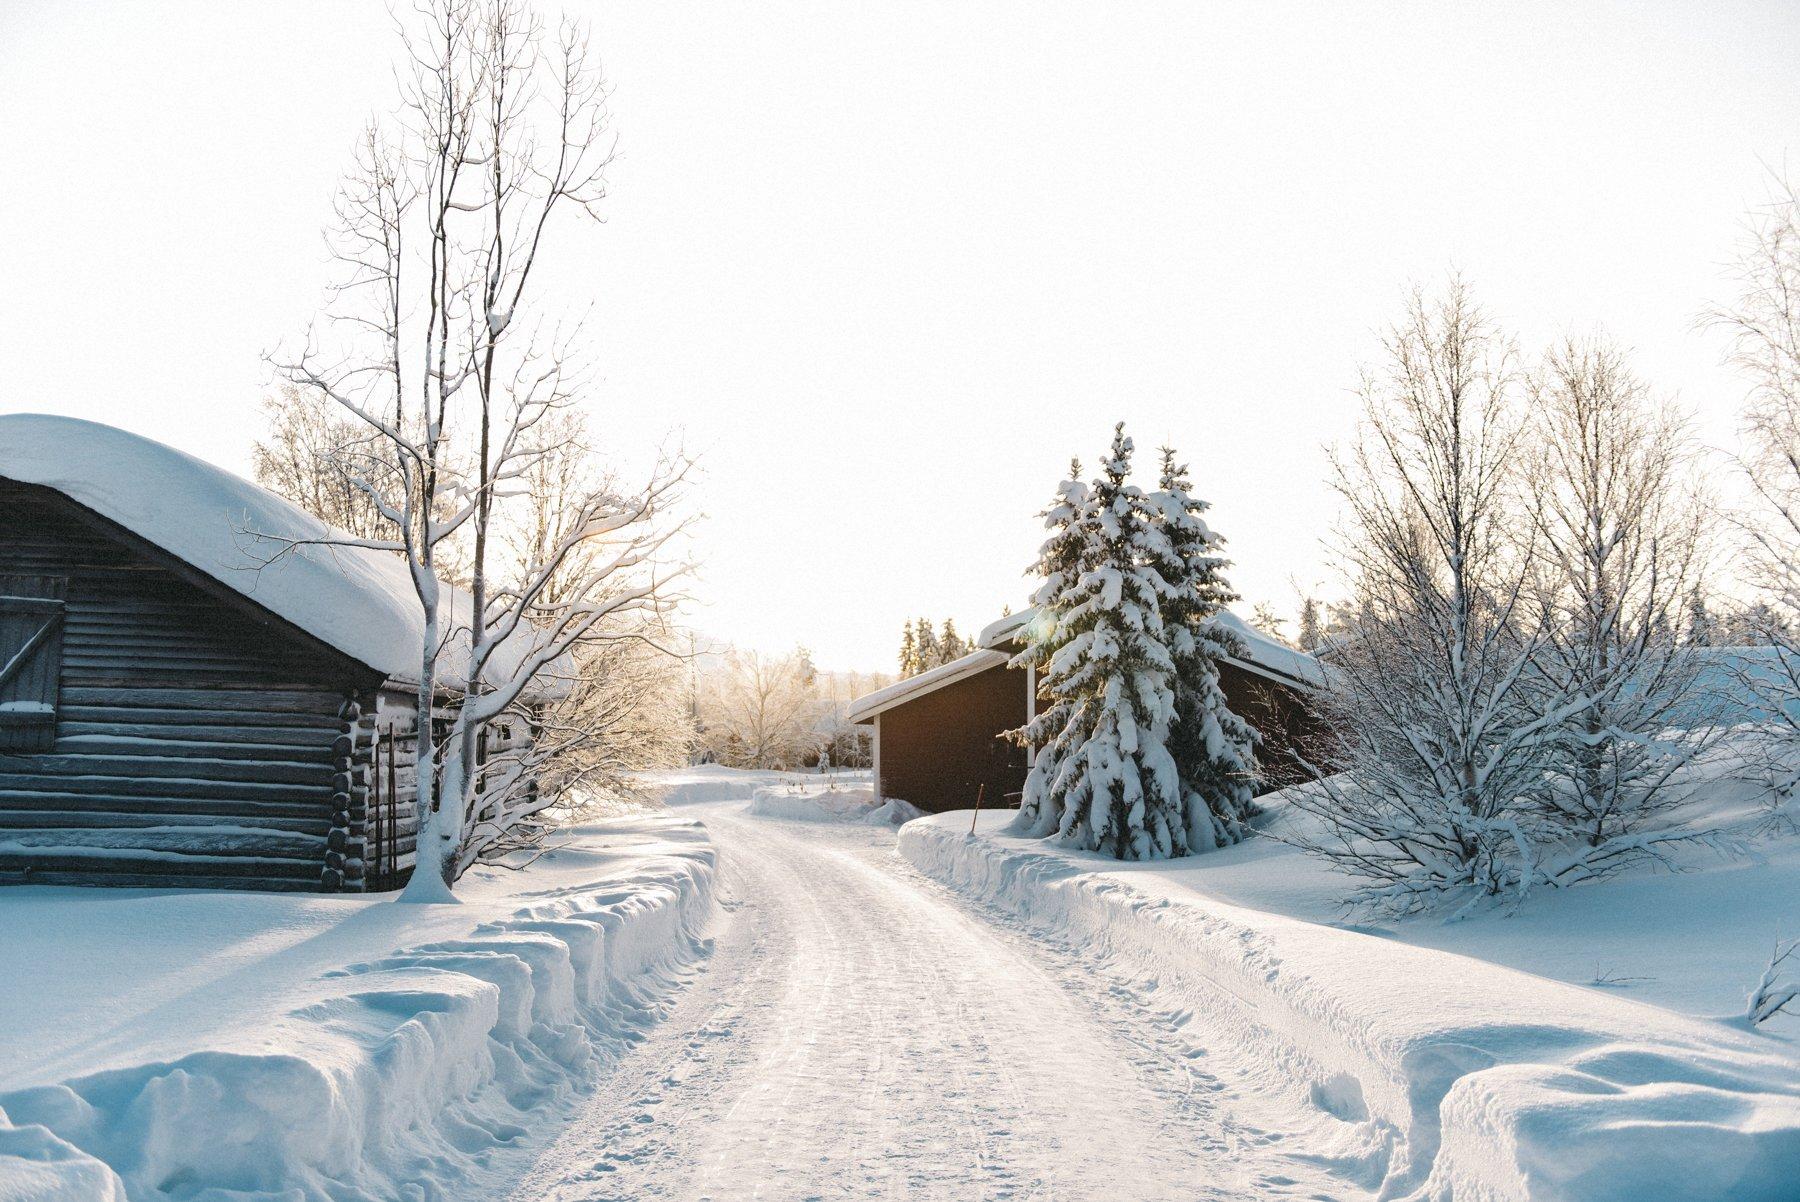 reisefotografie-lappland-finnland-106